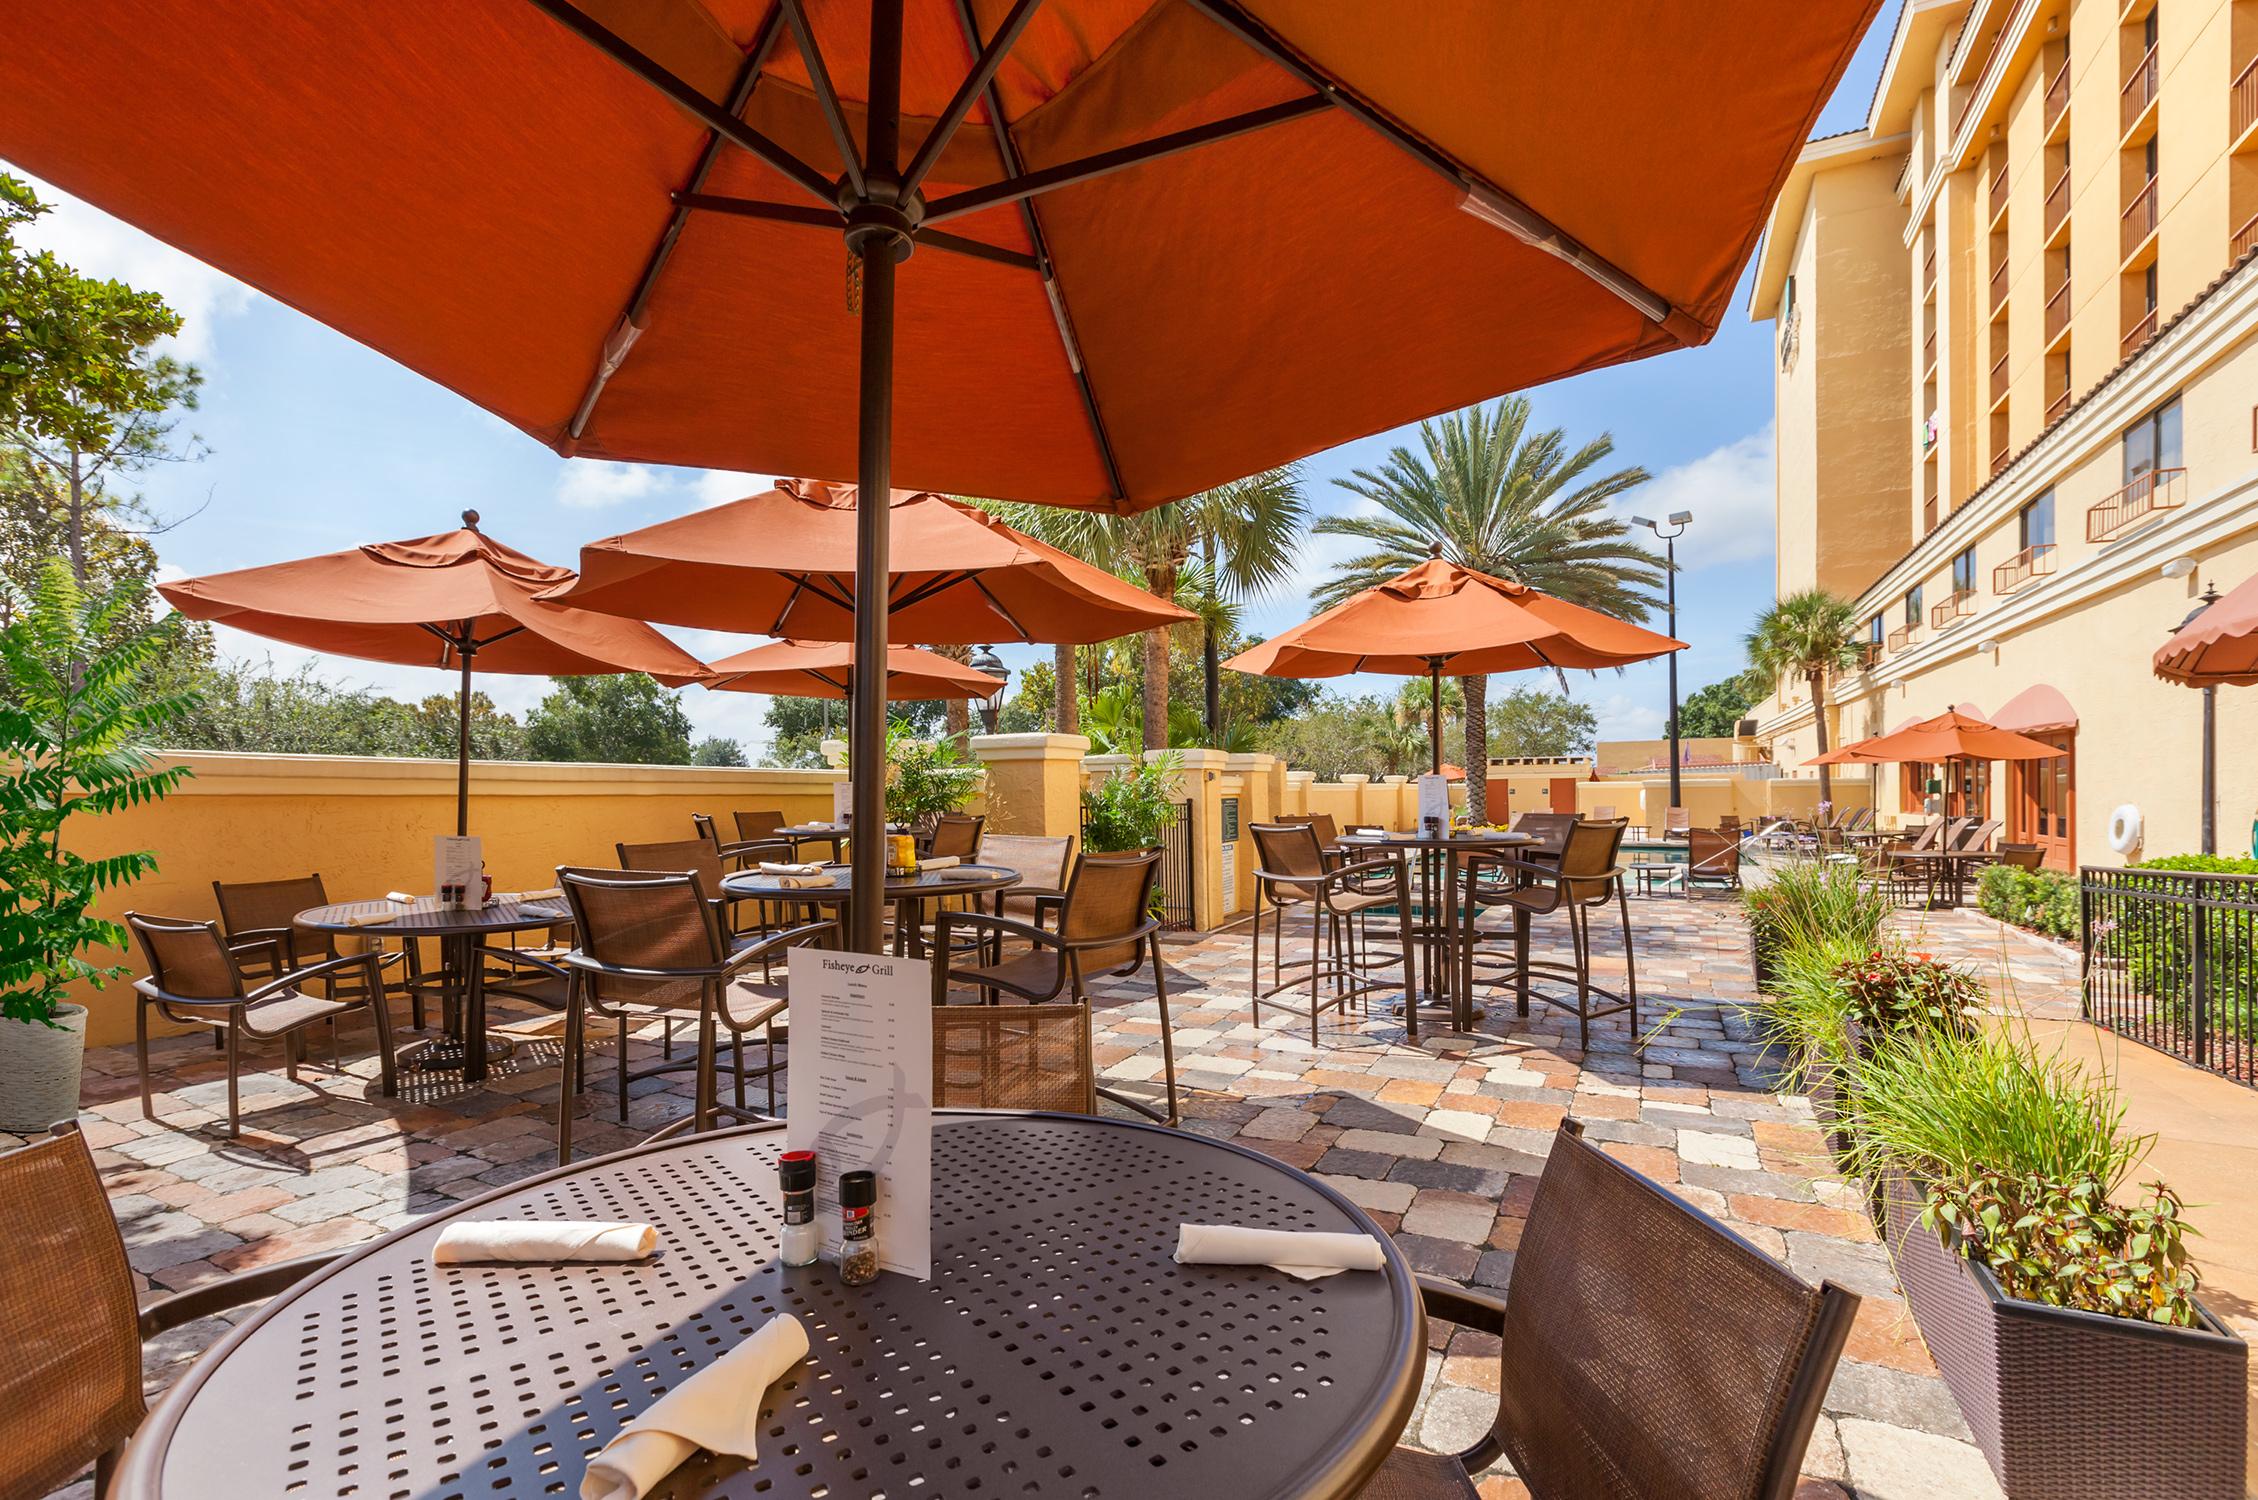 Embassy Suites Orlando International Drive South Convention Center In Orlando Fl 407 352 1400